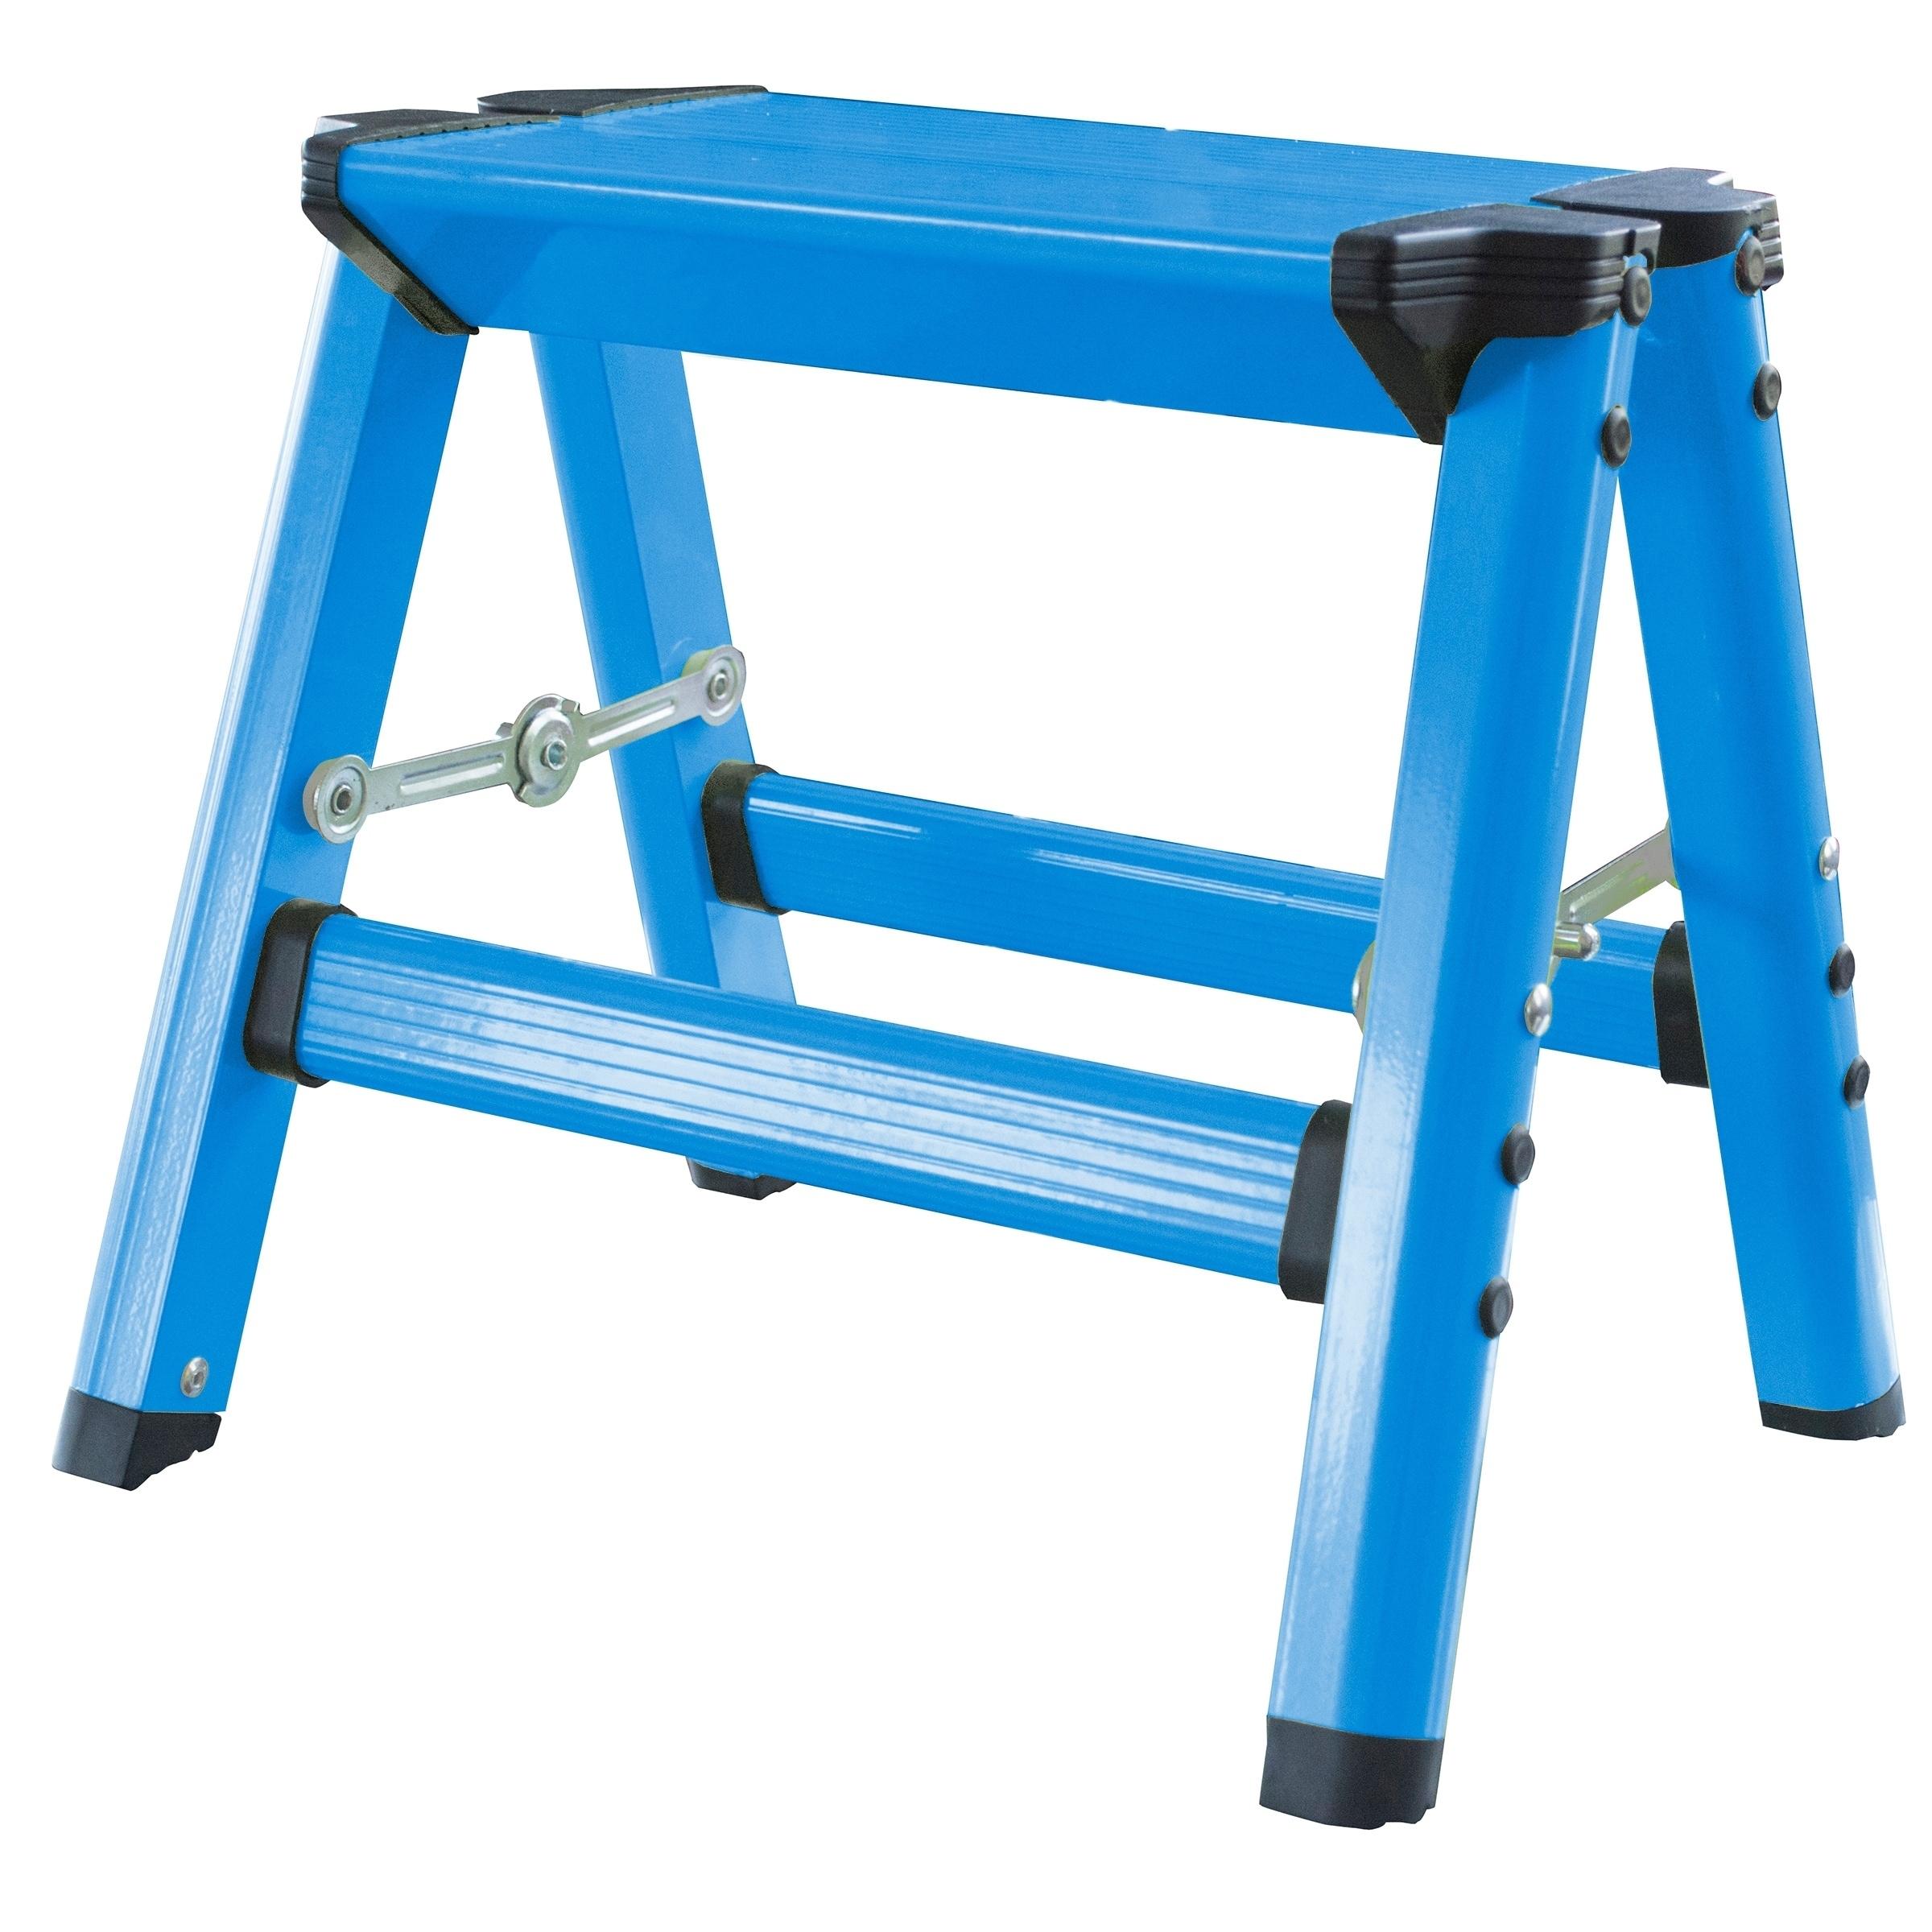 Incredible Amerihome Lightweight Single Step Aluminum Step Stool Bright Blue Alphanode Cool Chair Designs And Ideas Alphanodeonline